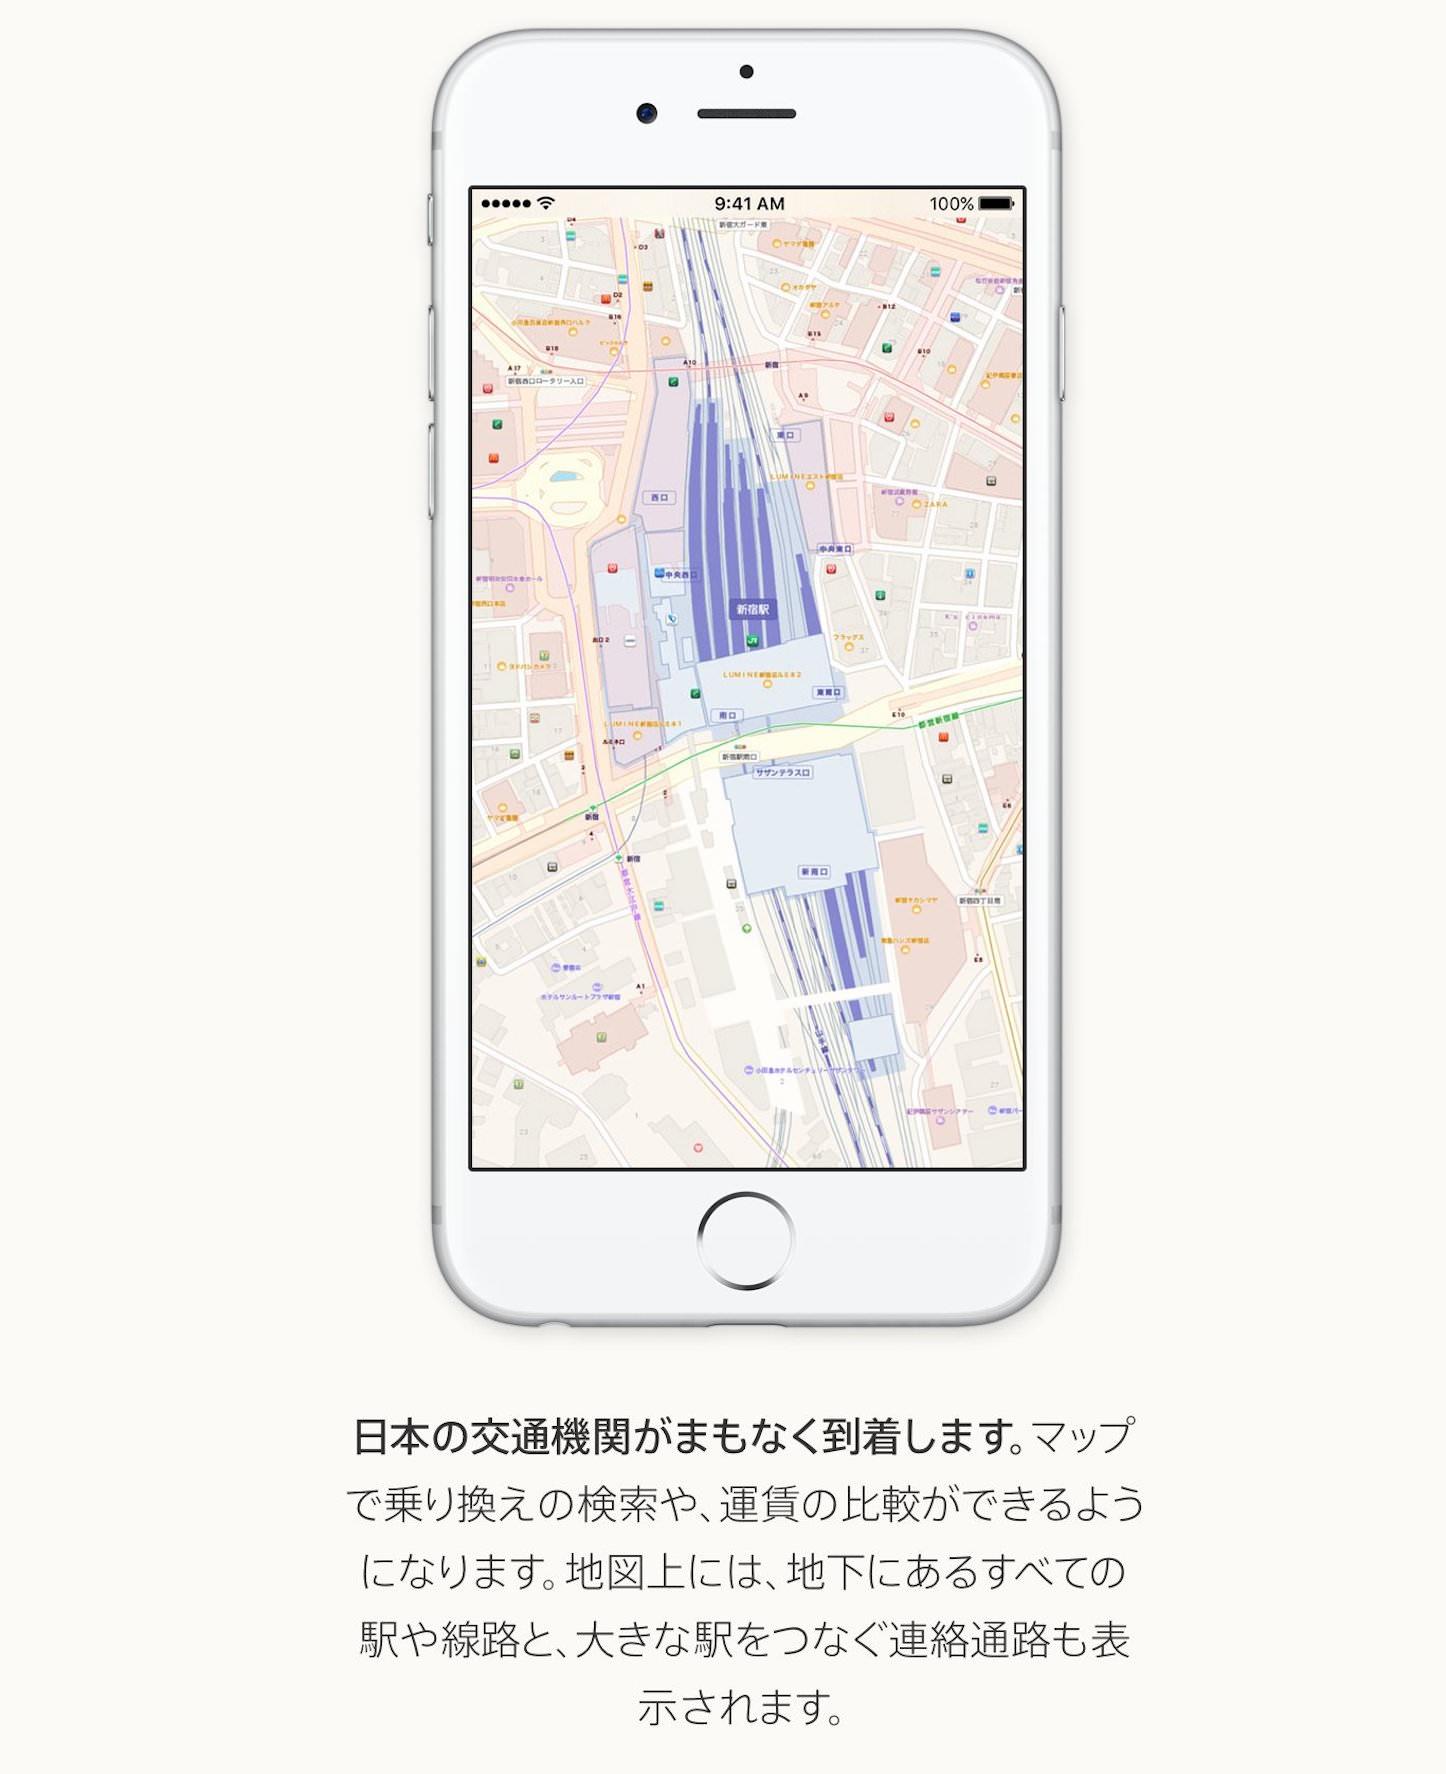 Transit-Info-on-Maps.jpg